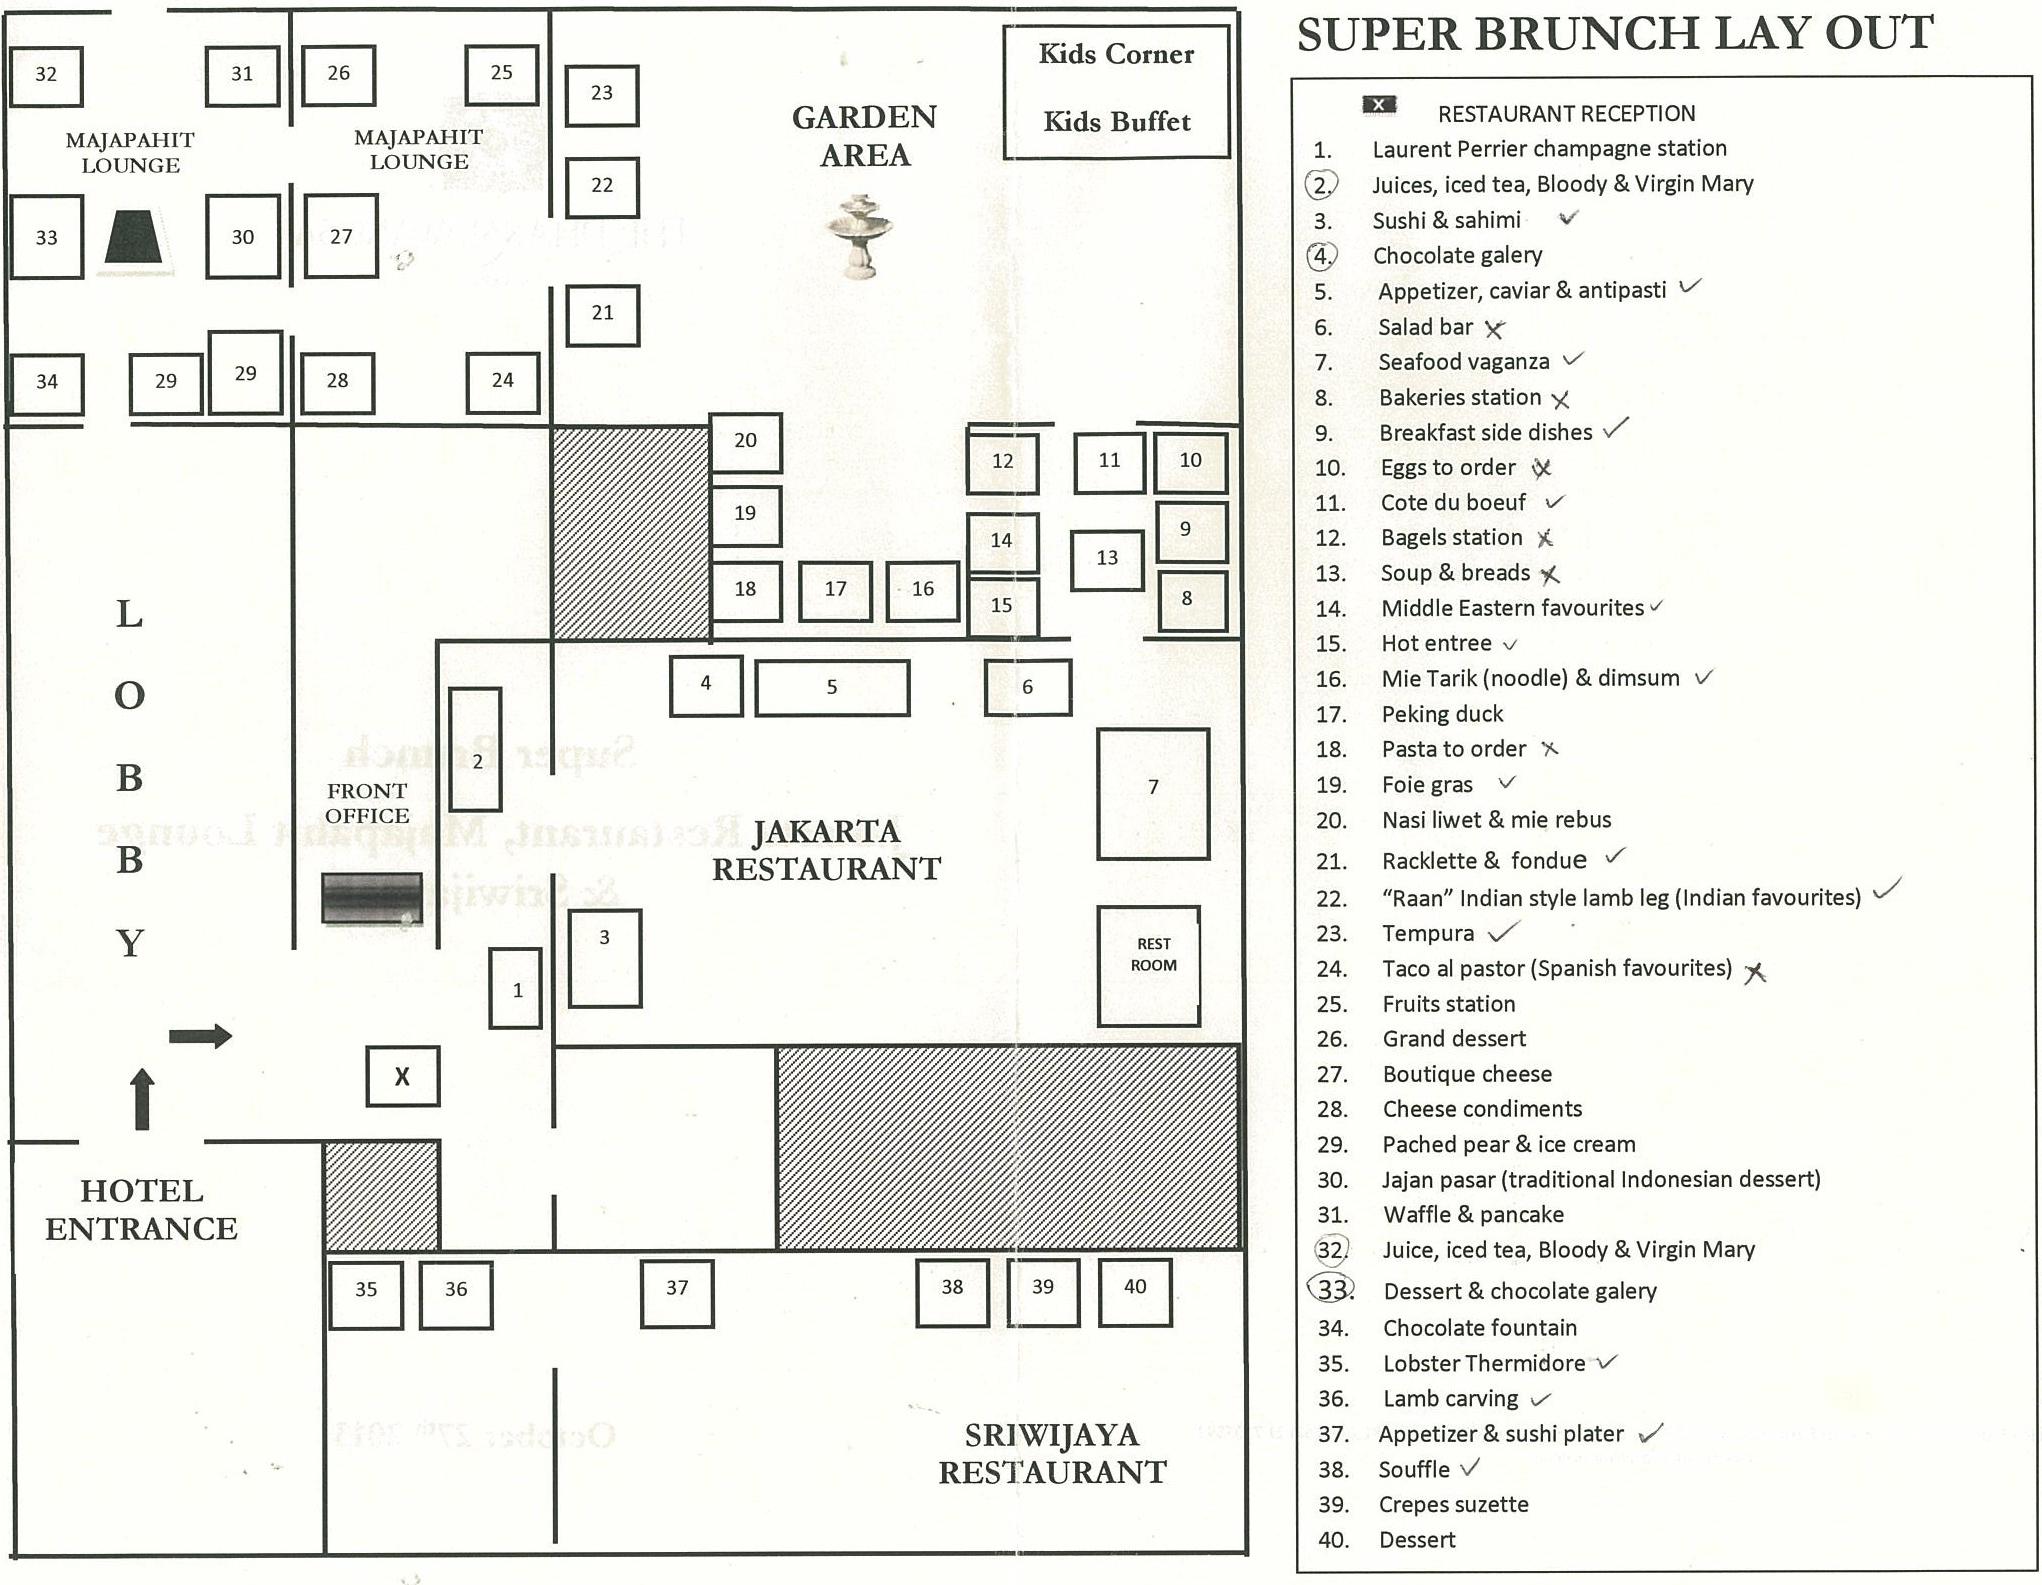 superbrunch-hotel-dharmawangsa_layout_2013.jpg